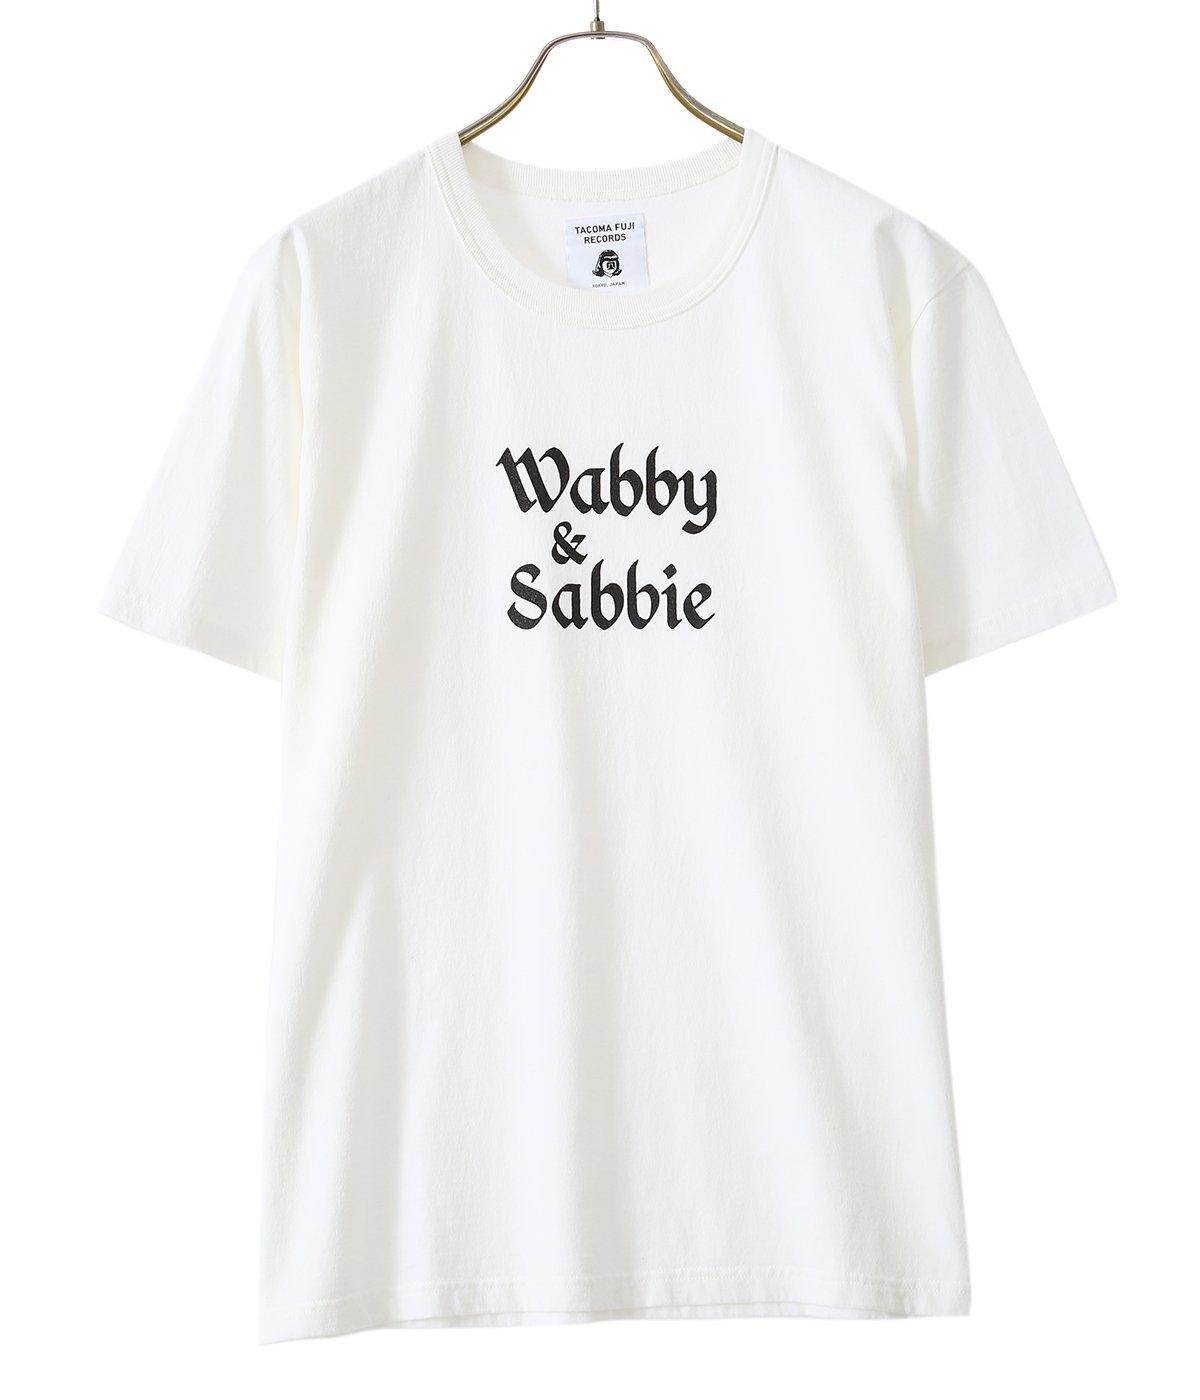 wabby & sabbie